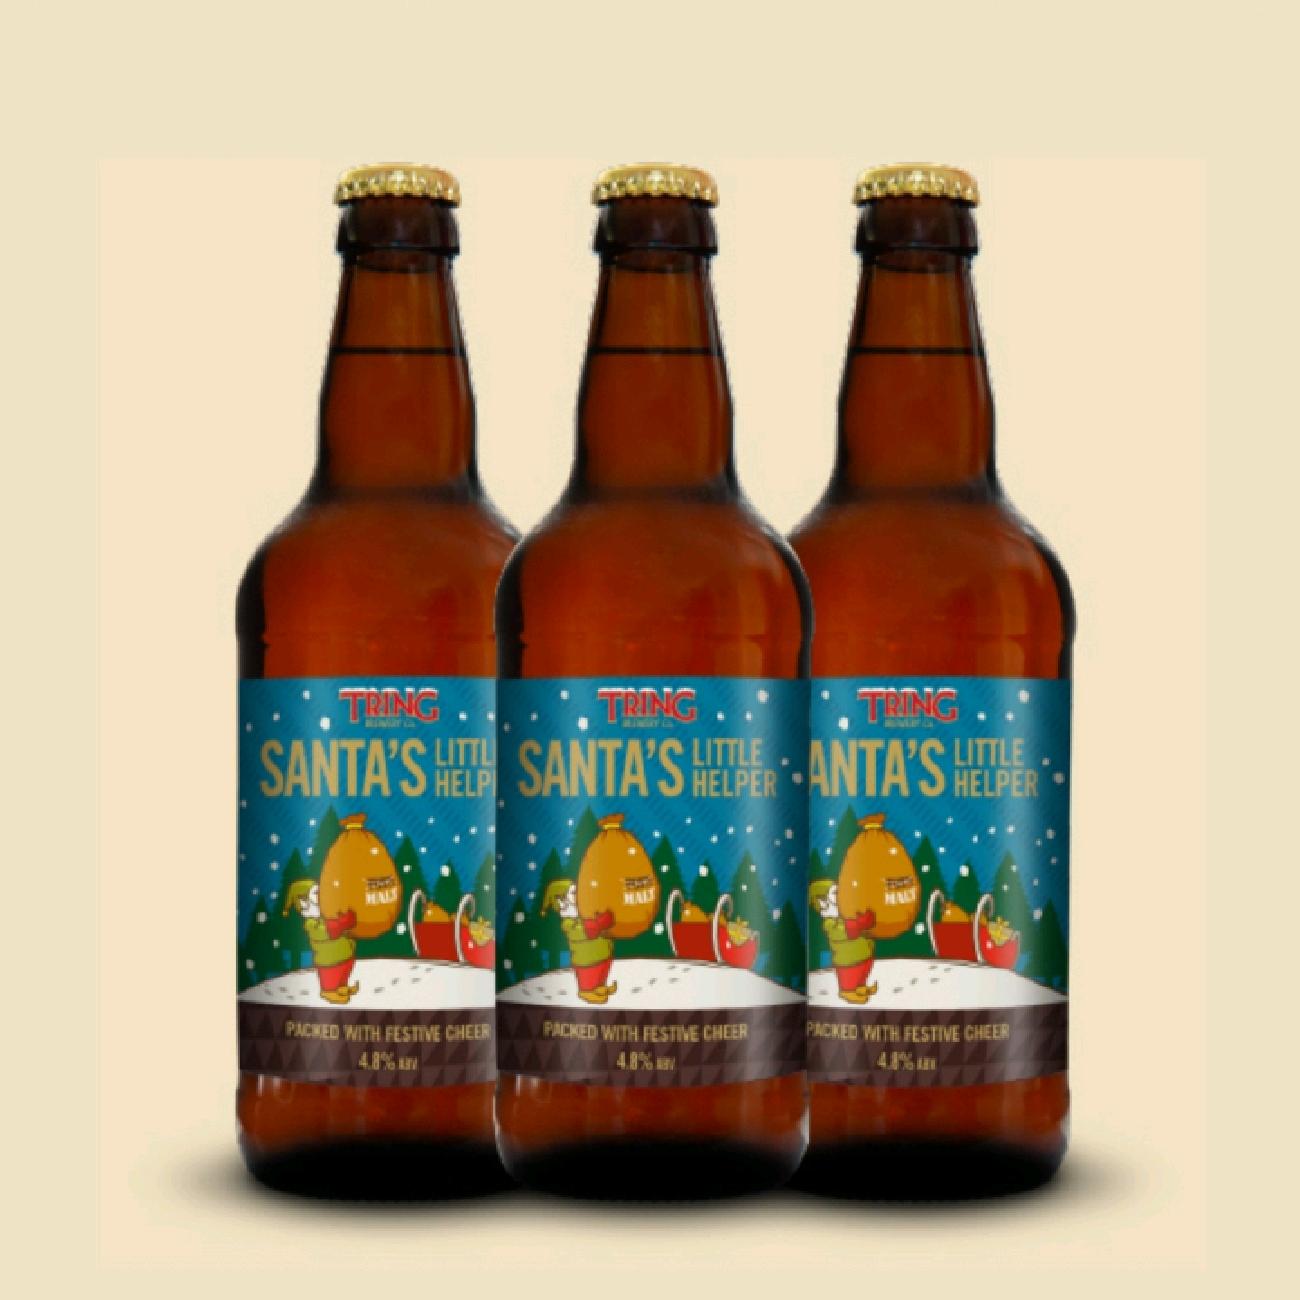 Santa's Little Helper (Tring Brewery)